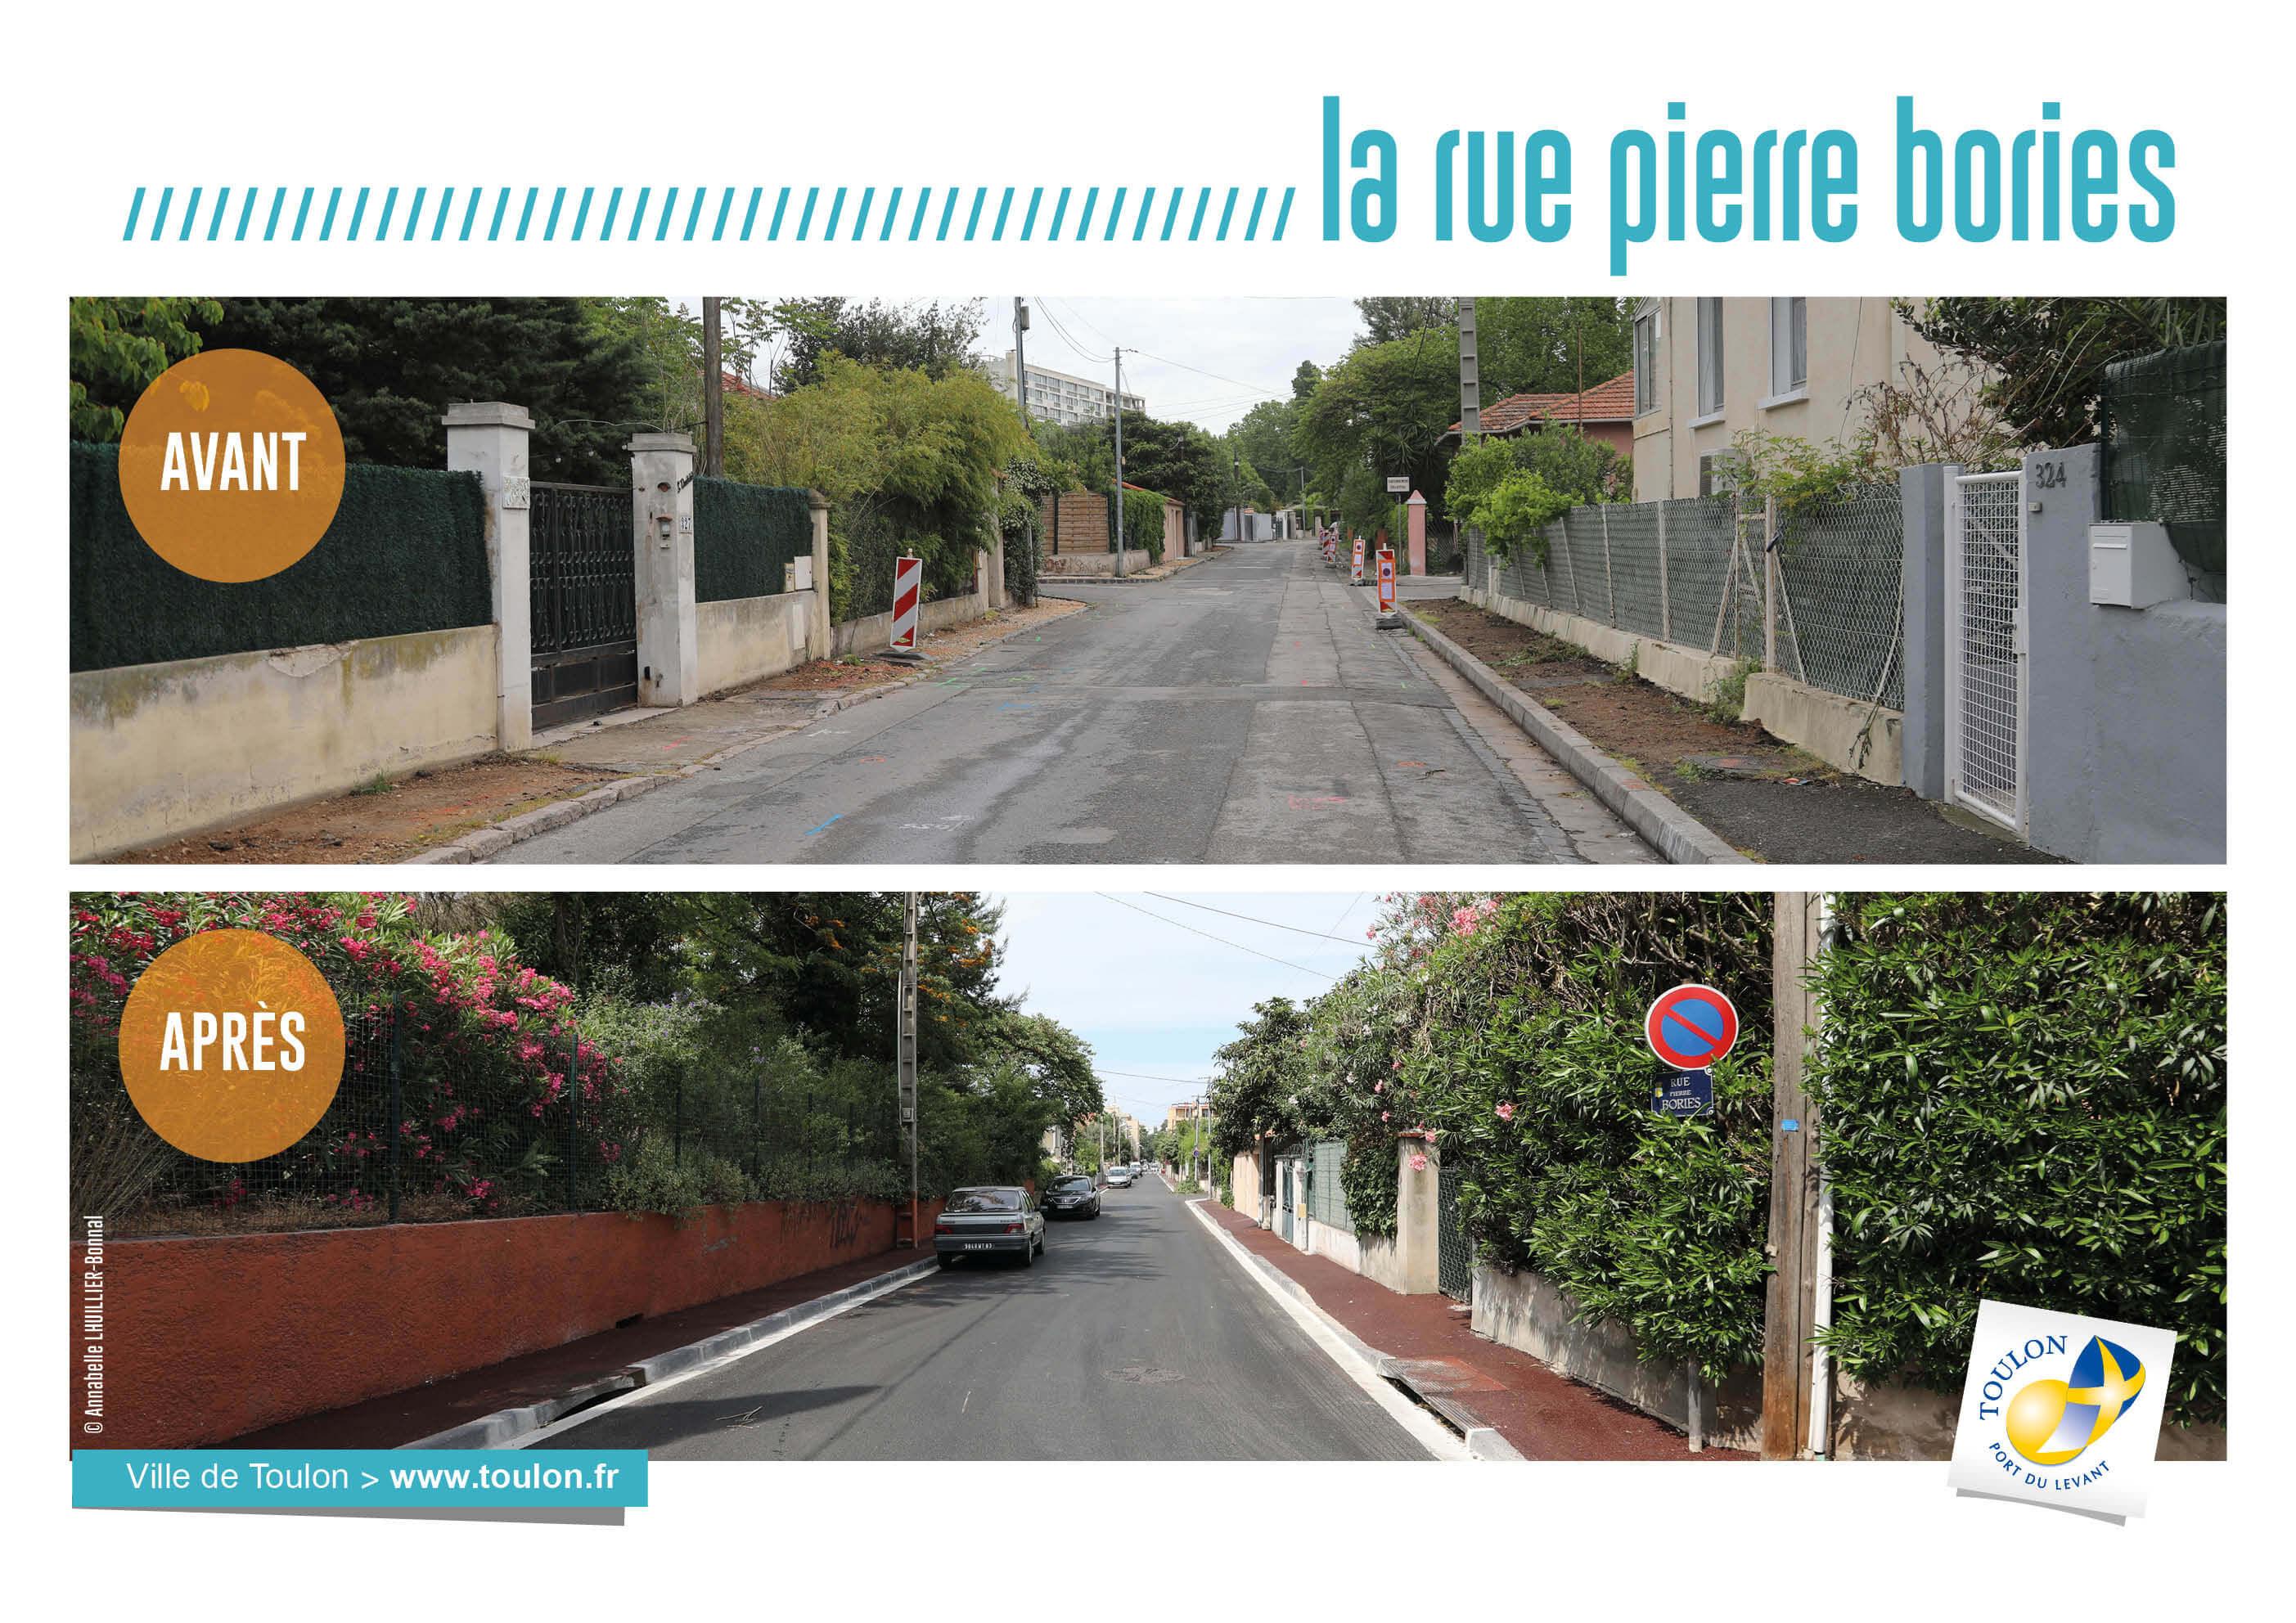 La rue pierre bories